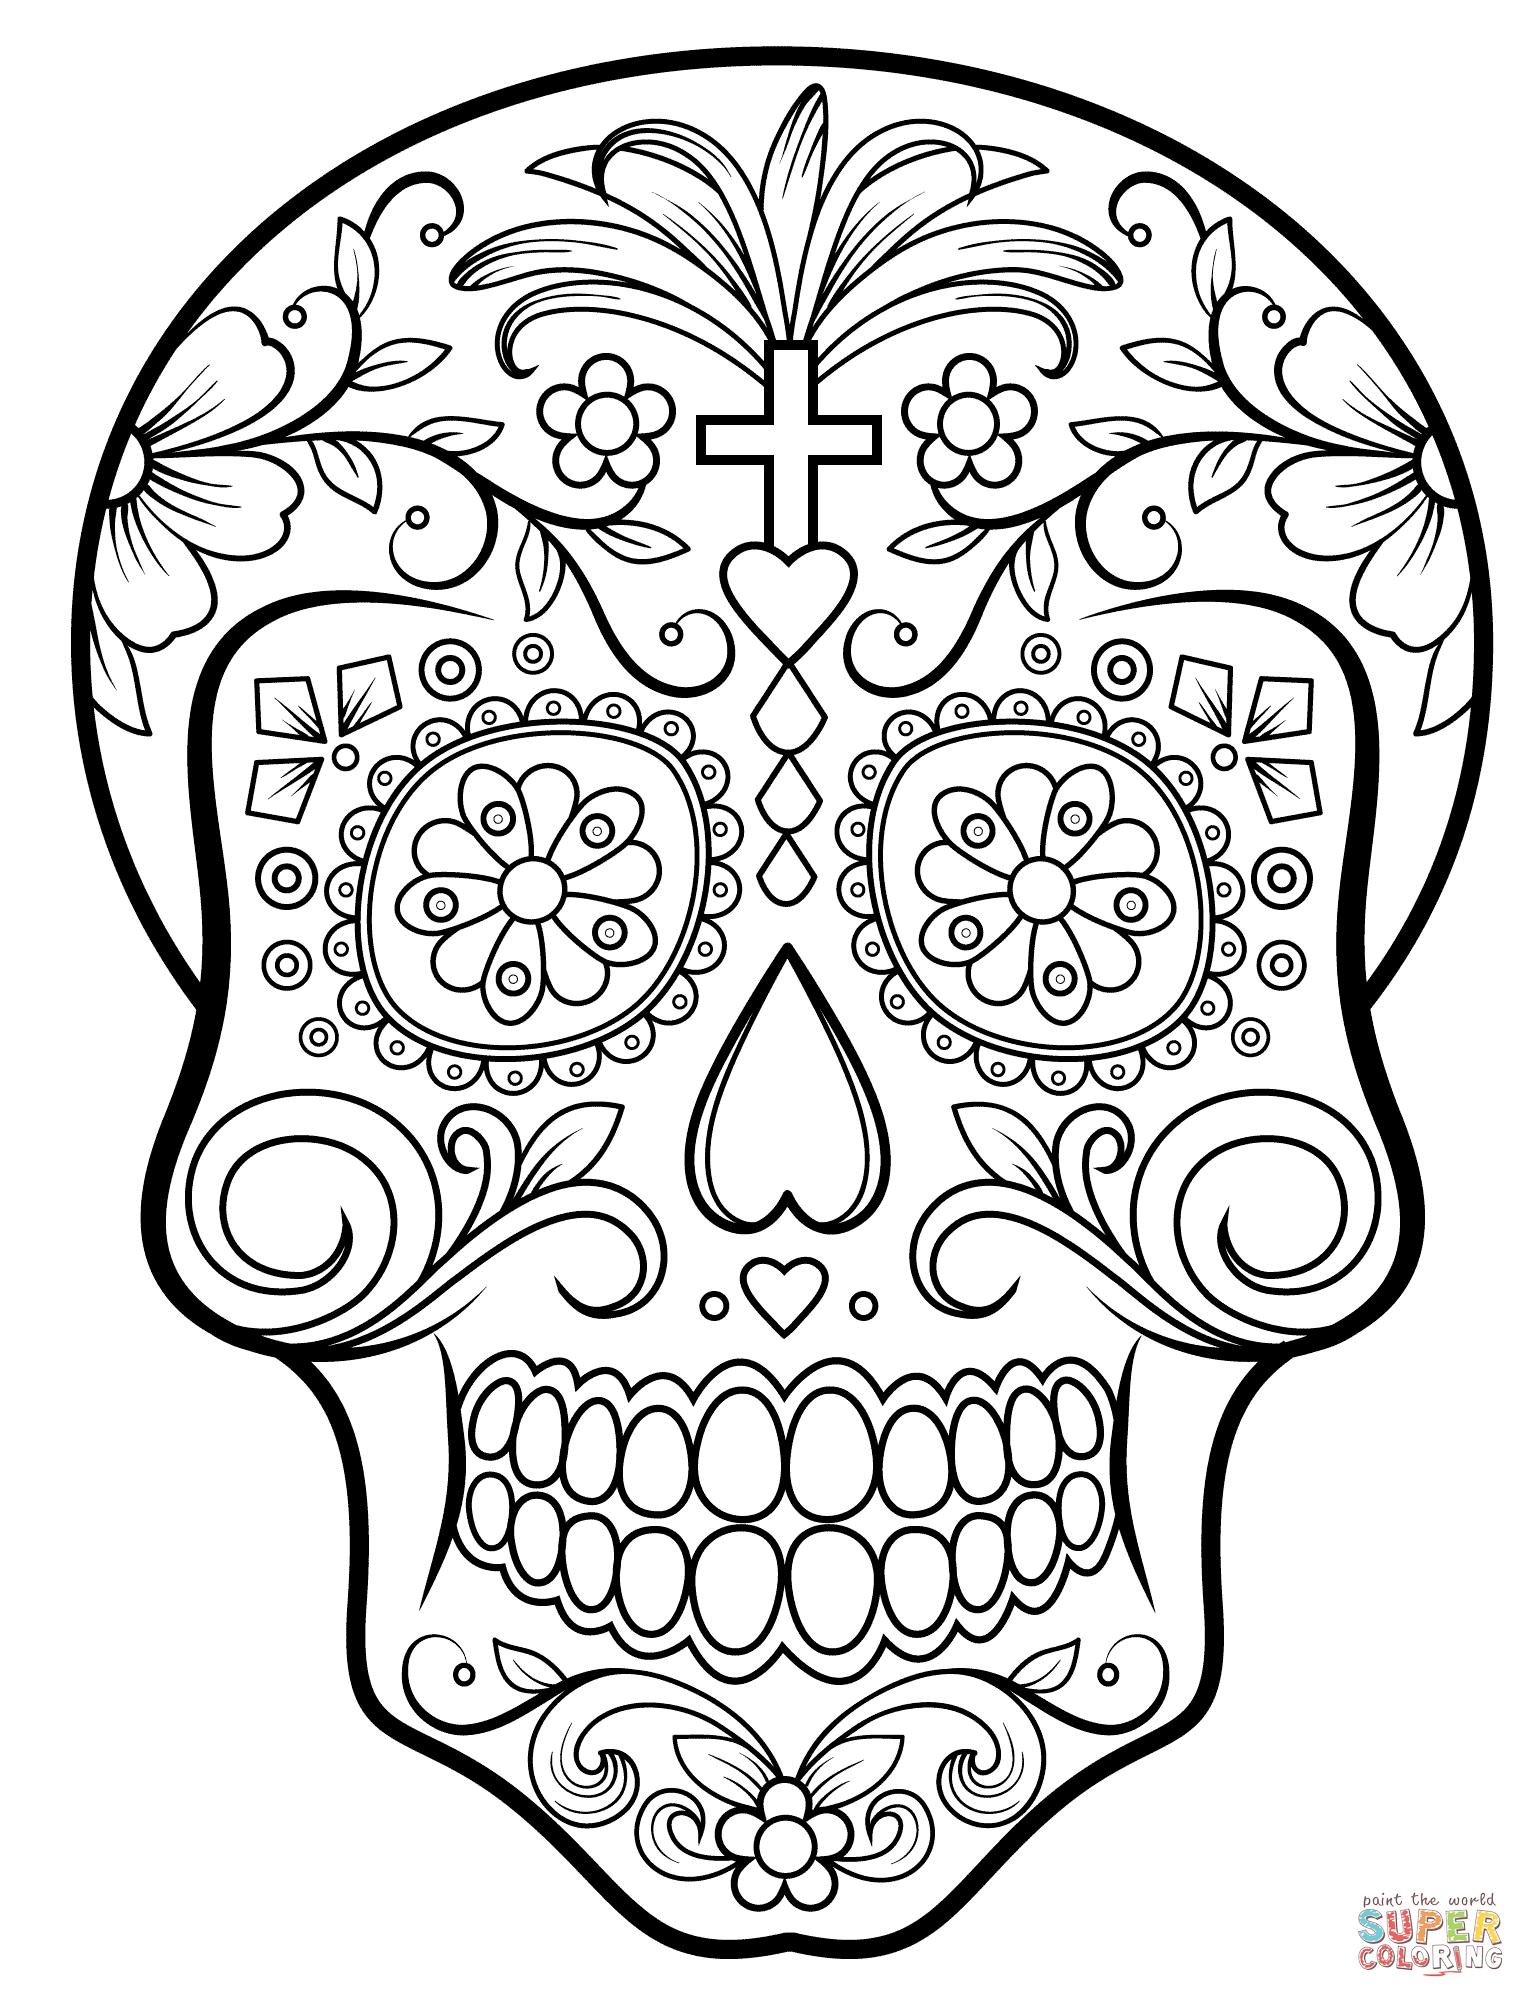 Sugar Skulls Coloring Pages | Free Coloring Pages - Free Printable Sugar Skull Coloring Pages